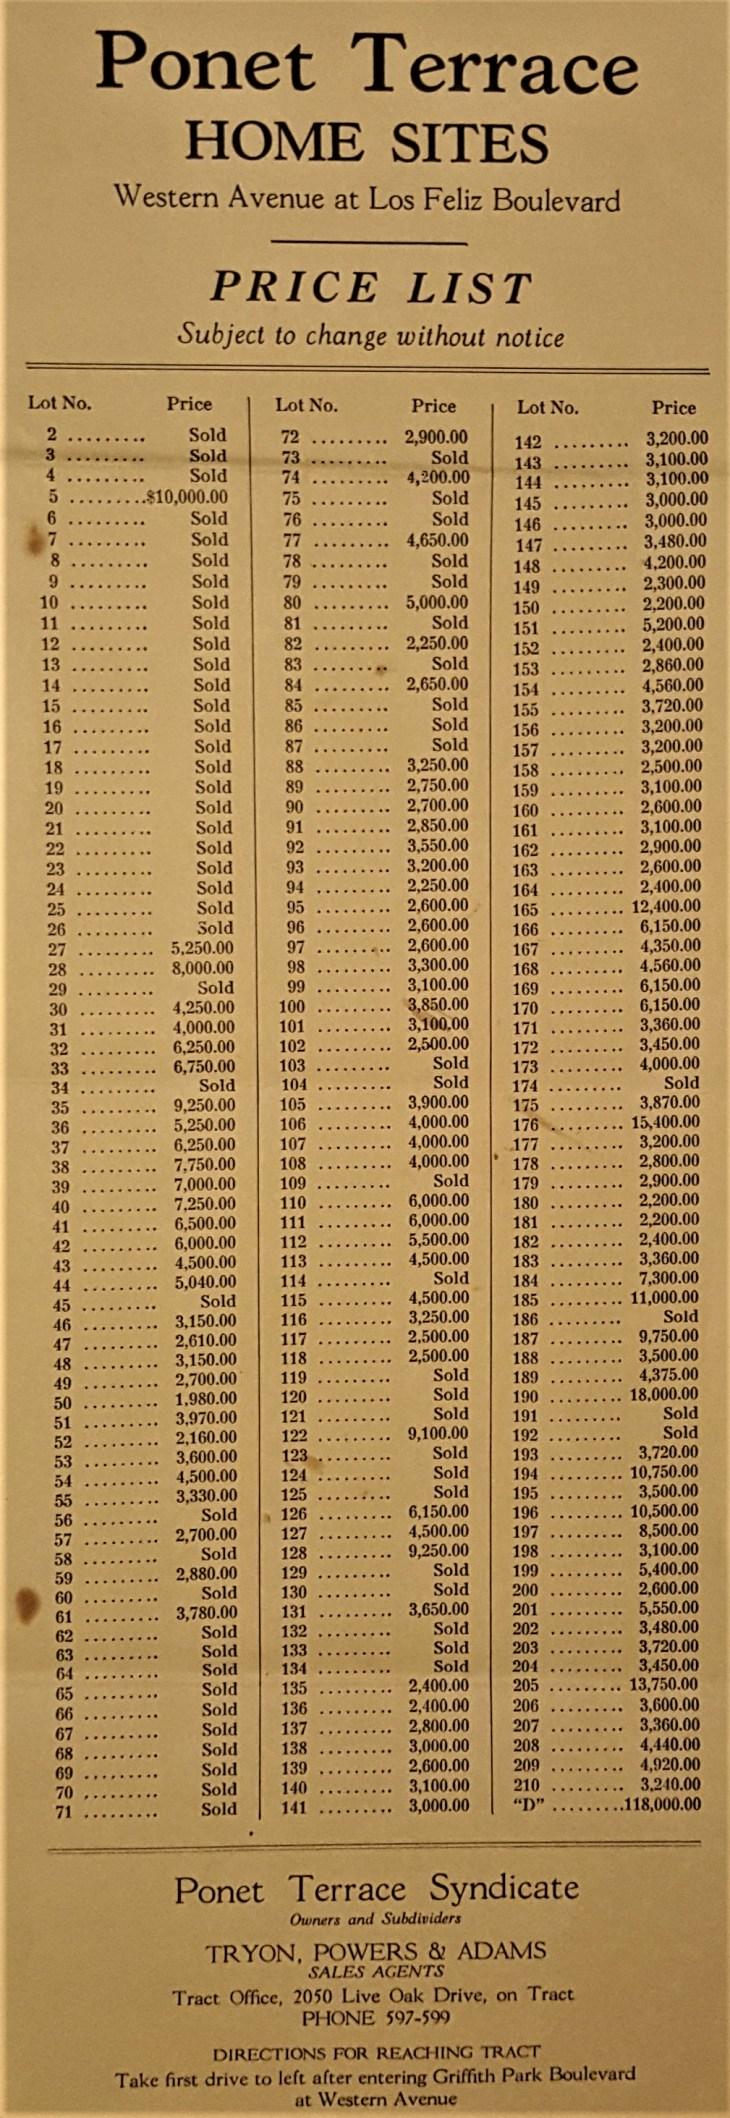 Ponet Terrace price list